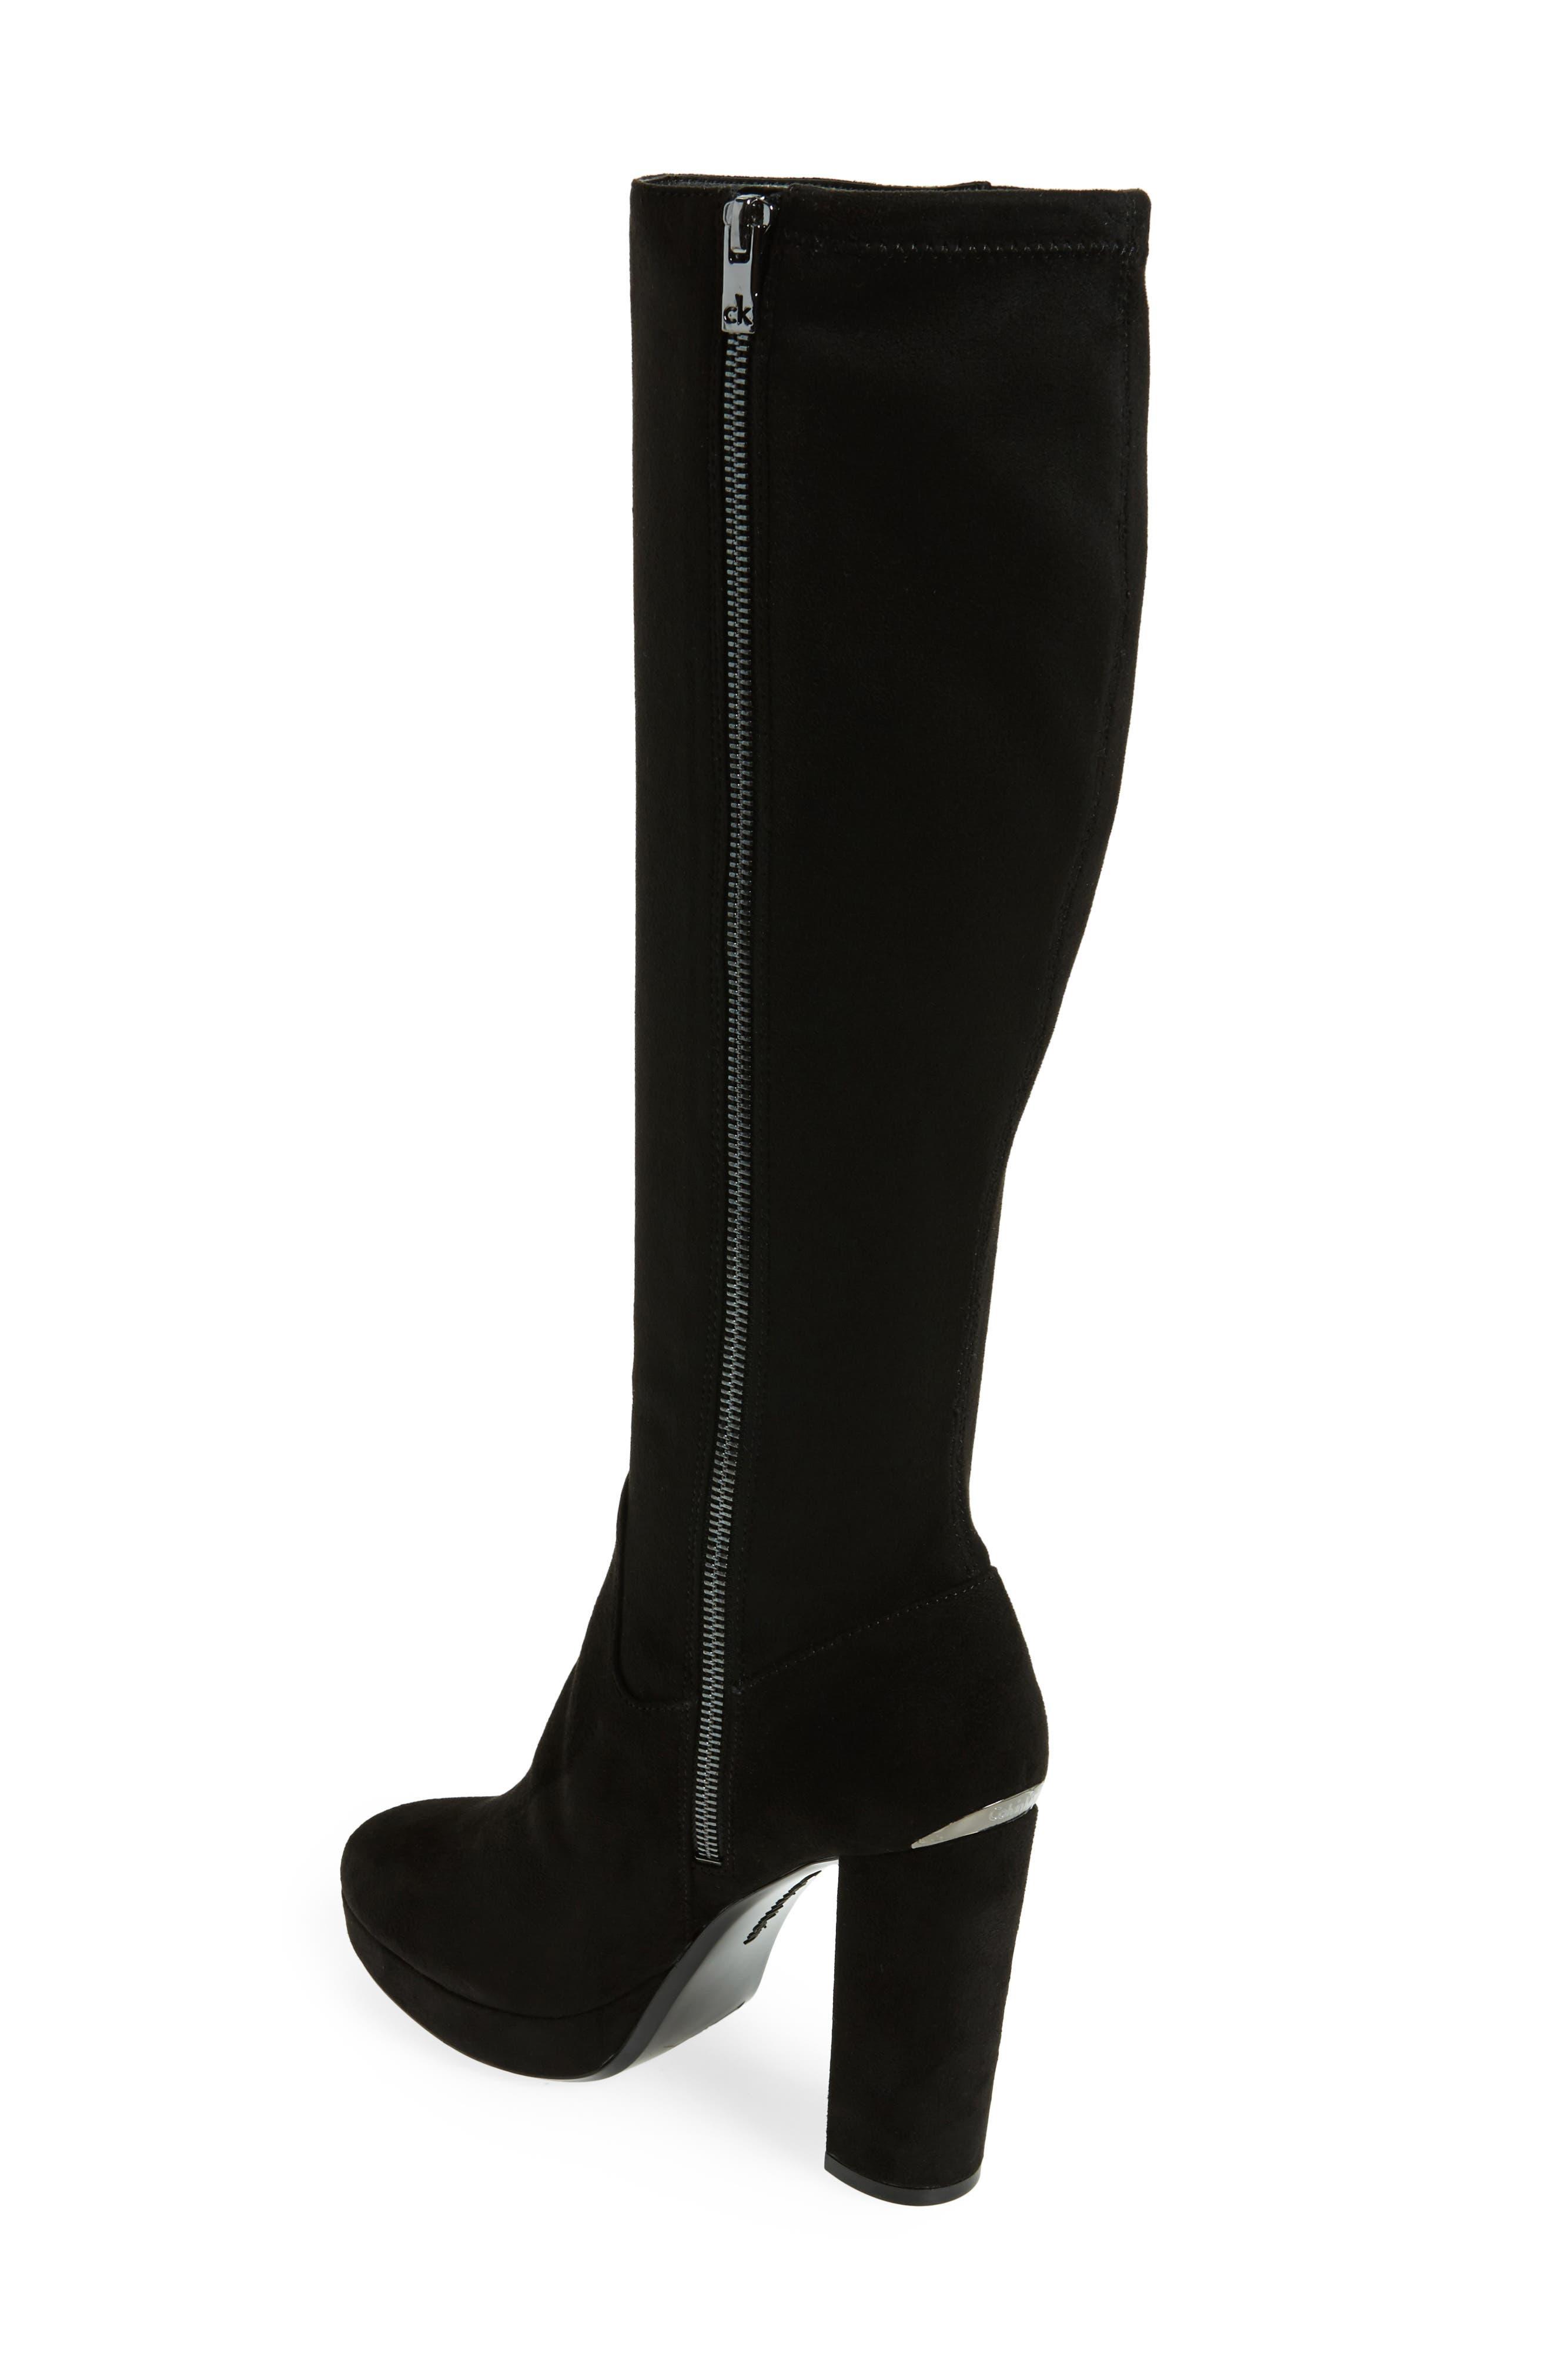 Mailia Tall Boot,                             Alternate thumbnail 2, color,                             001